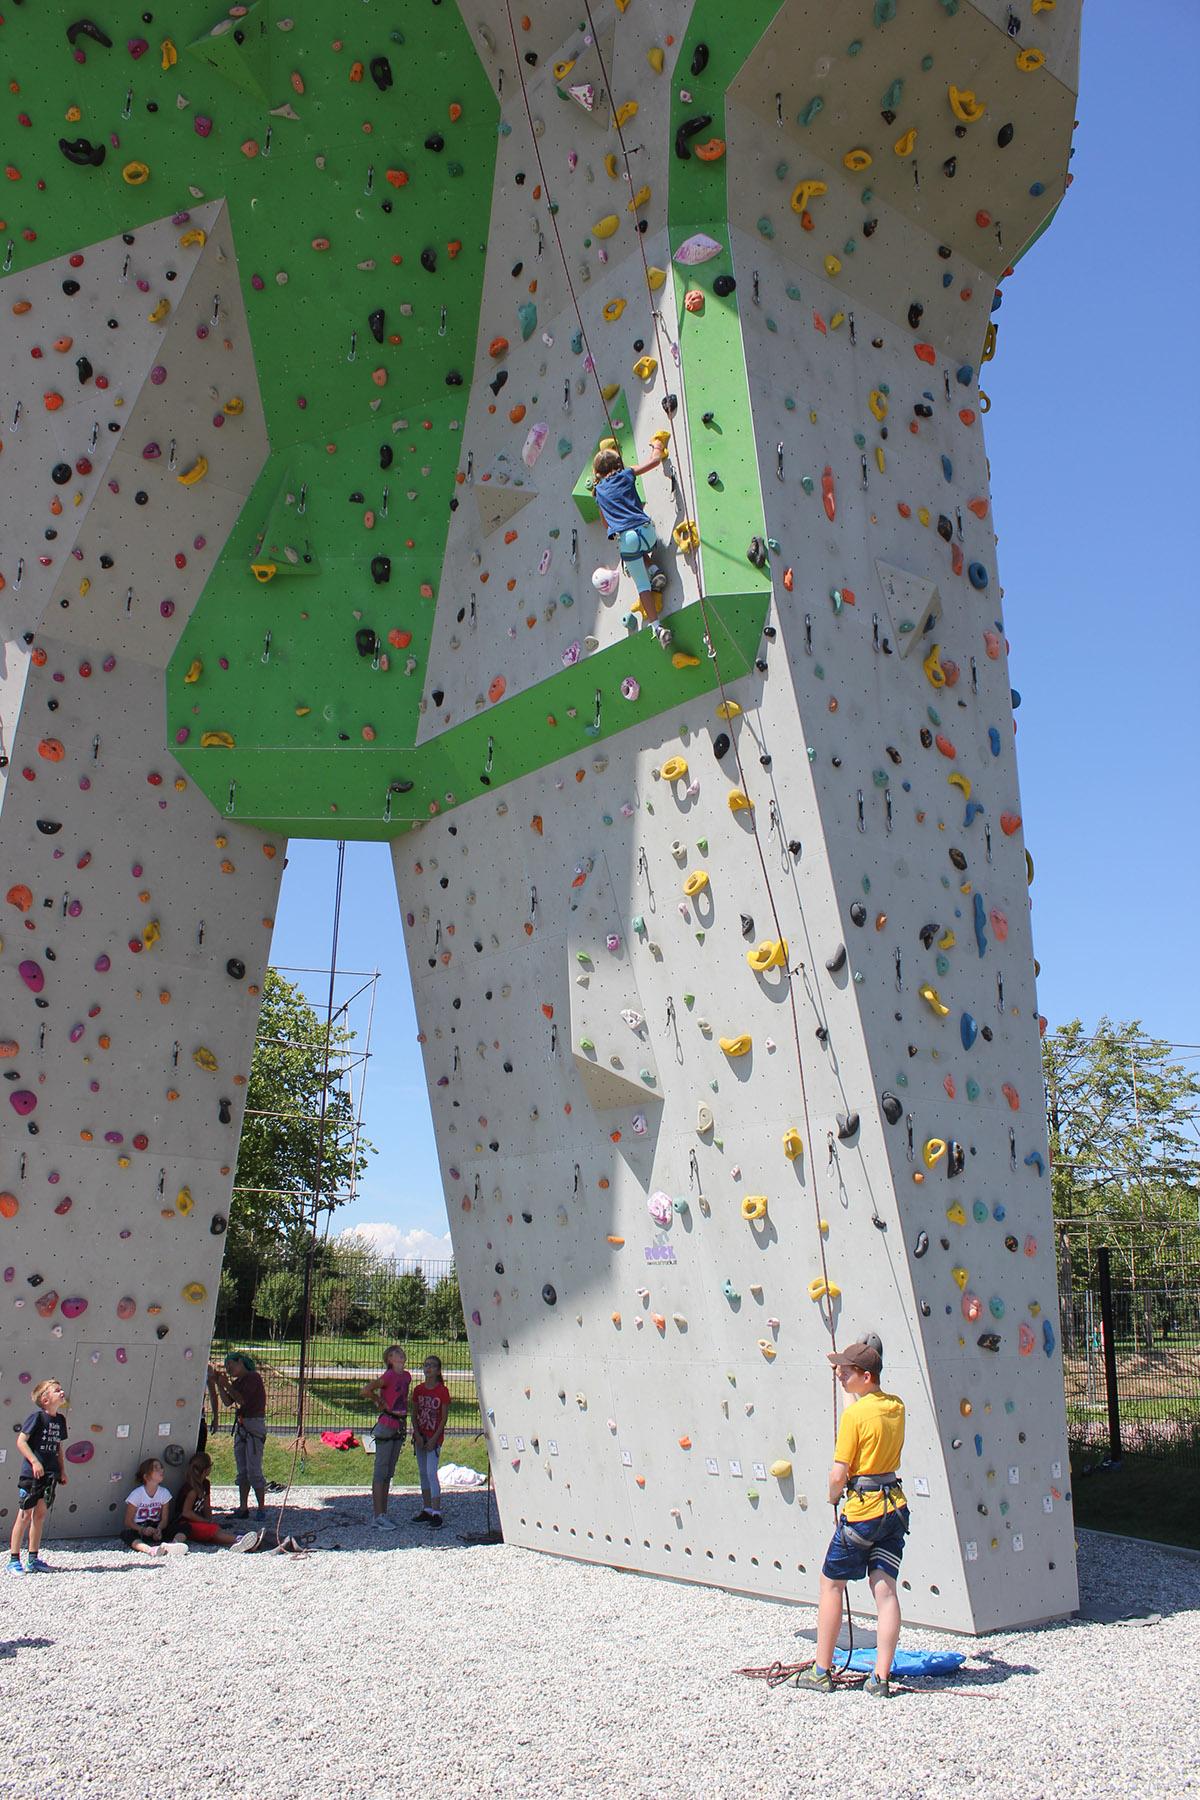 09 Klettern am Überhang